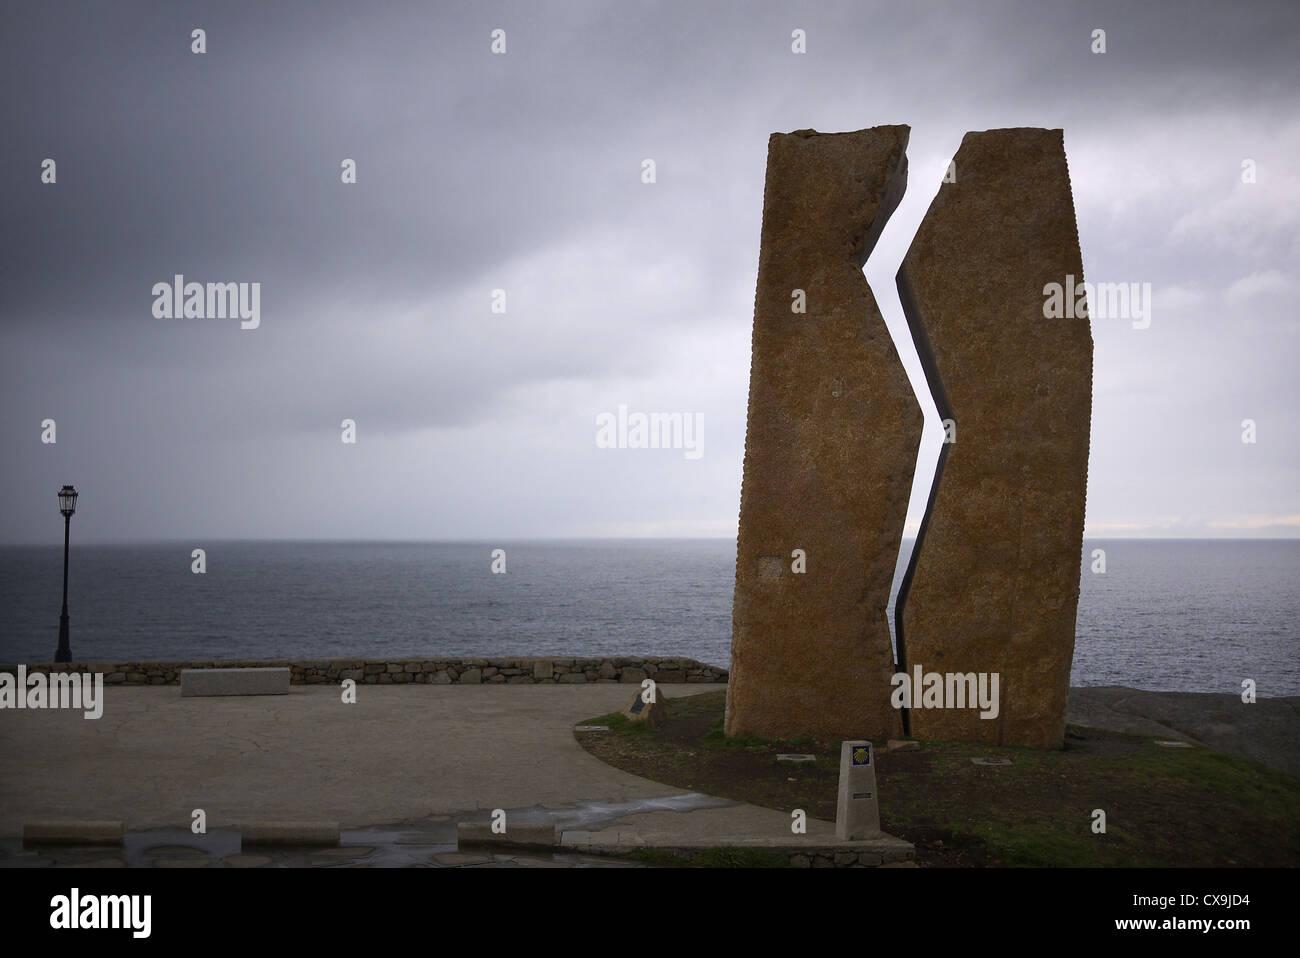 Muxia, Spain. Memorial to the Prestige oil spill. - Stock Image